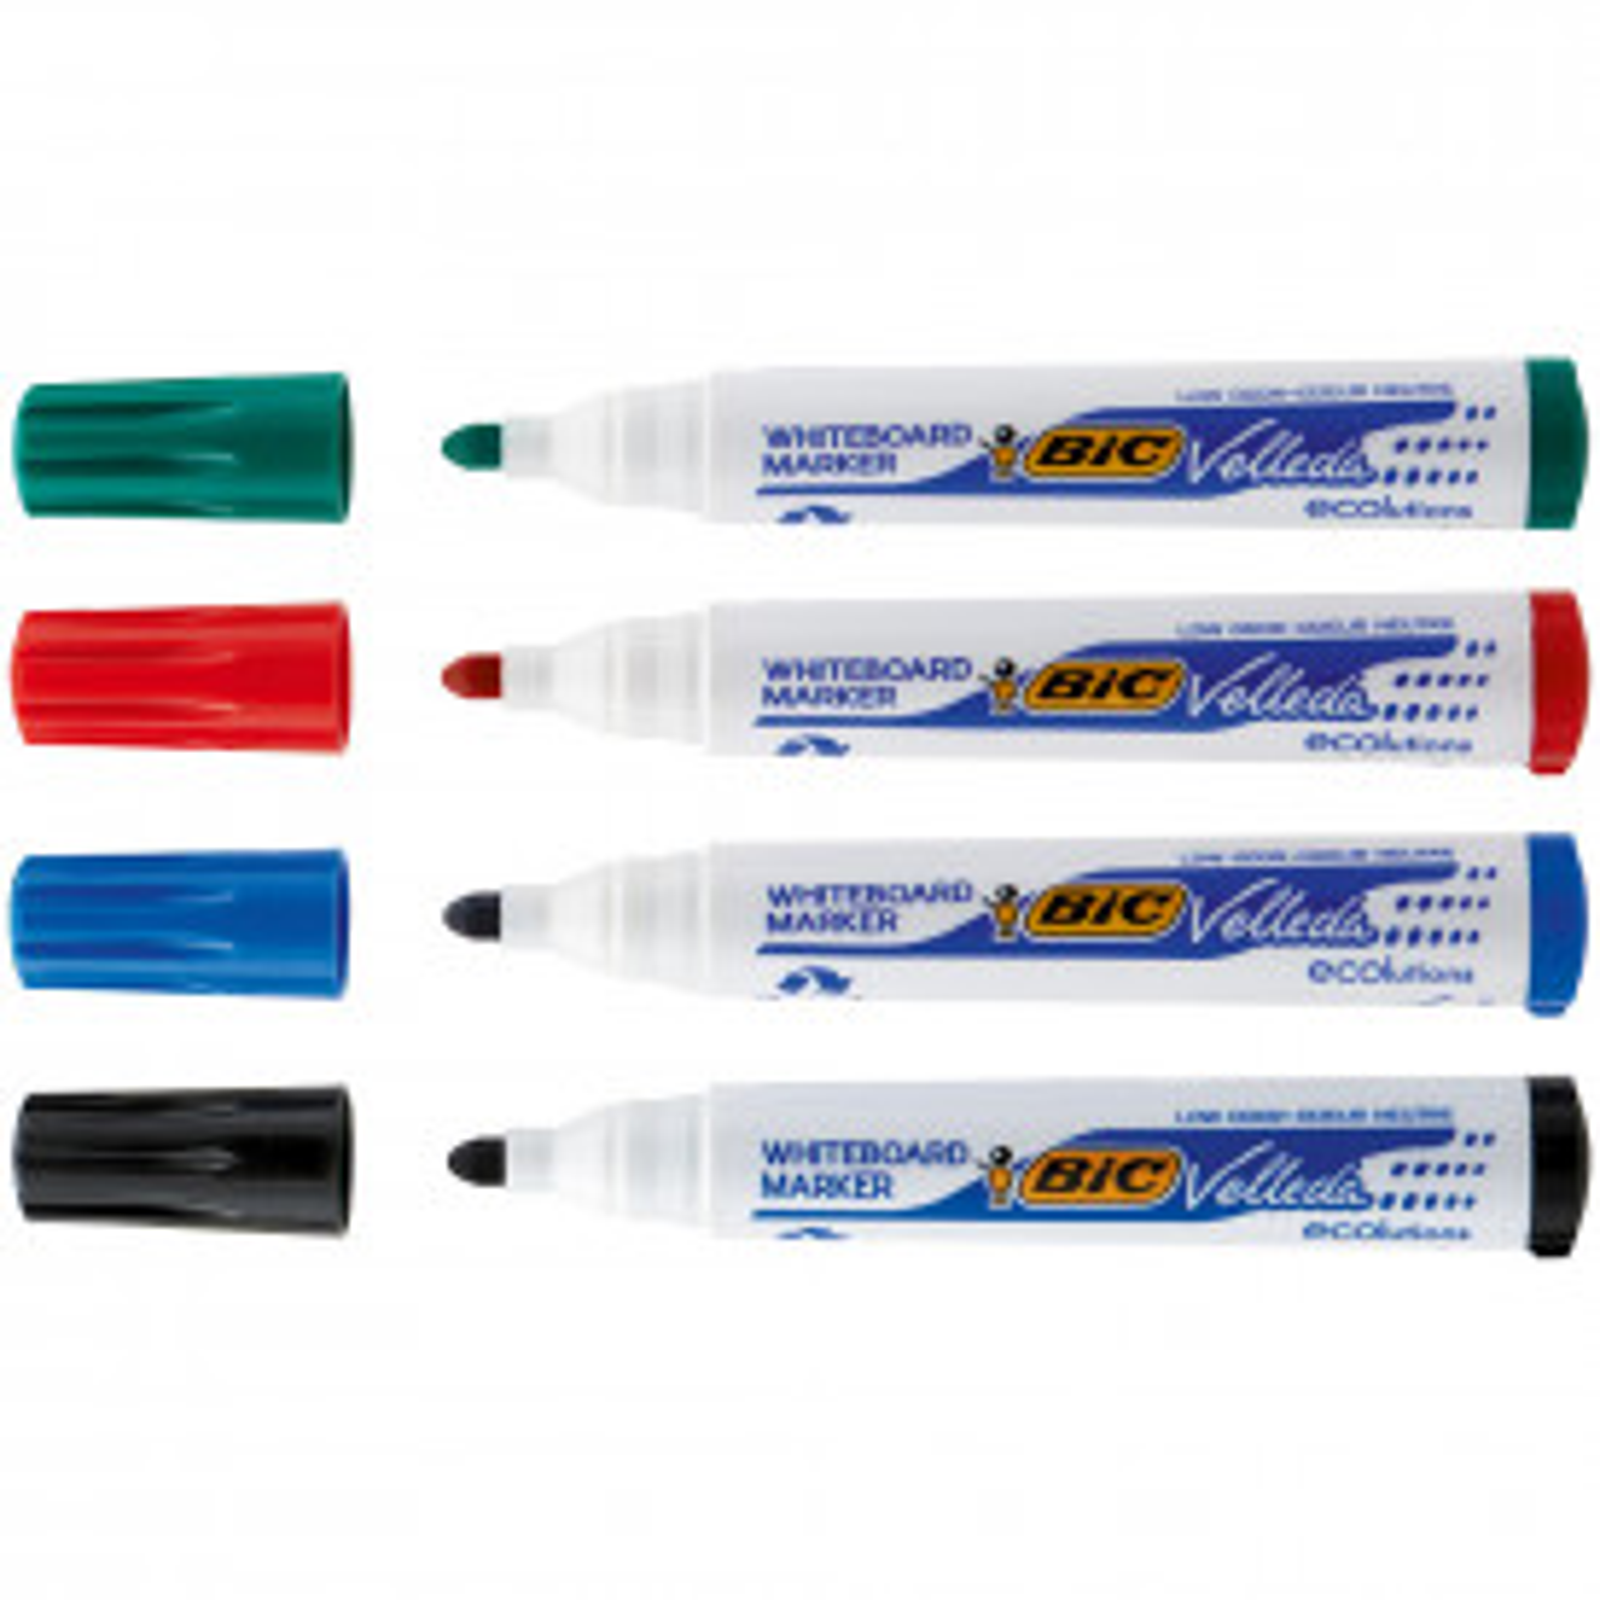 BIC® Velleda 1701 ECOlutions Drywipe Marker